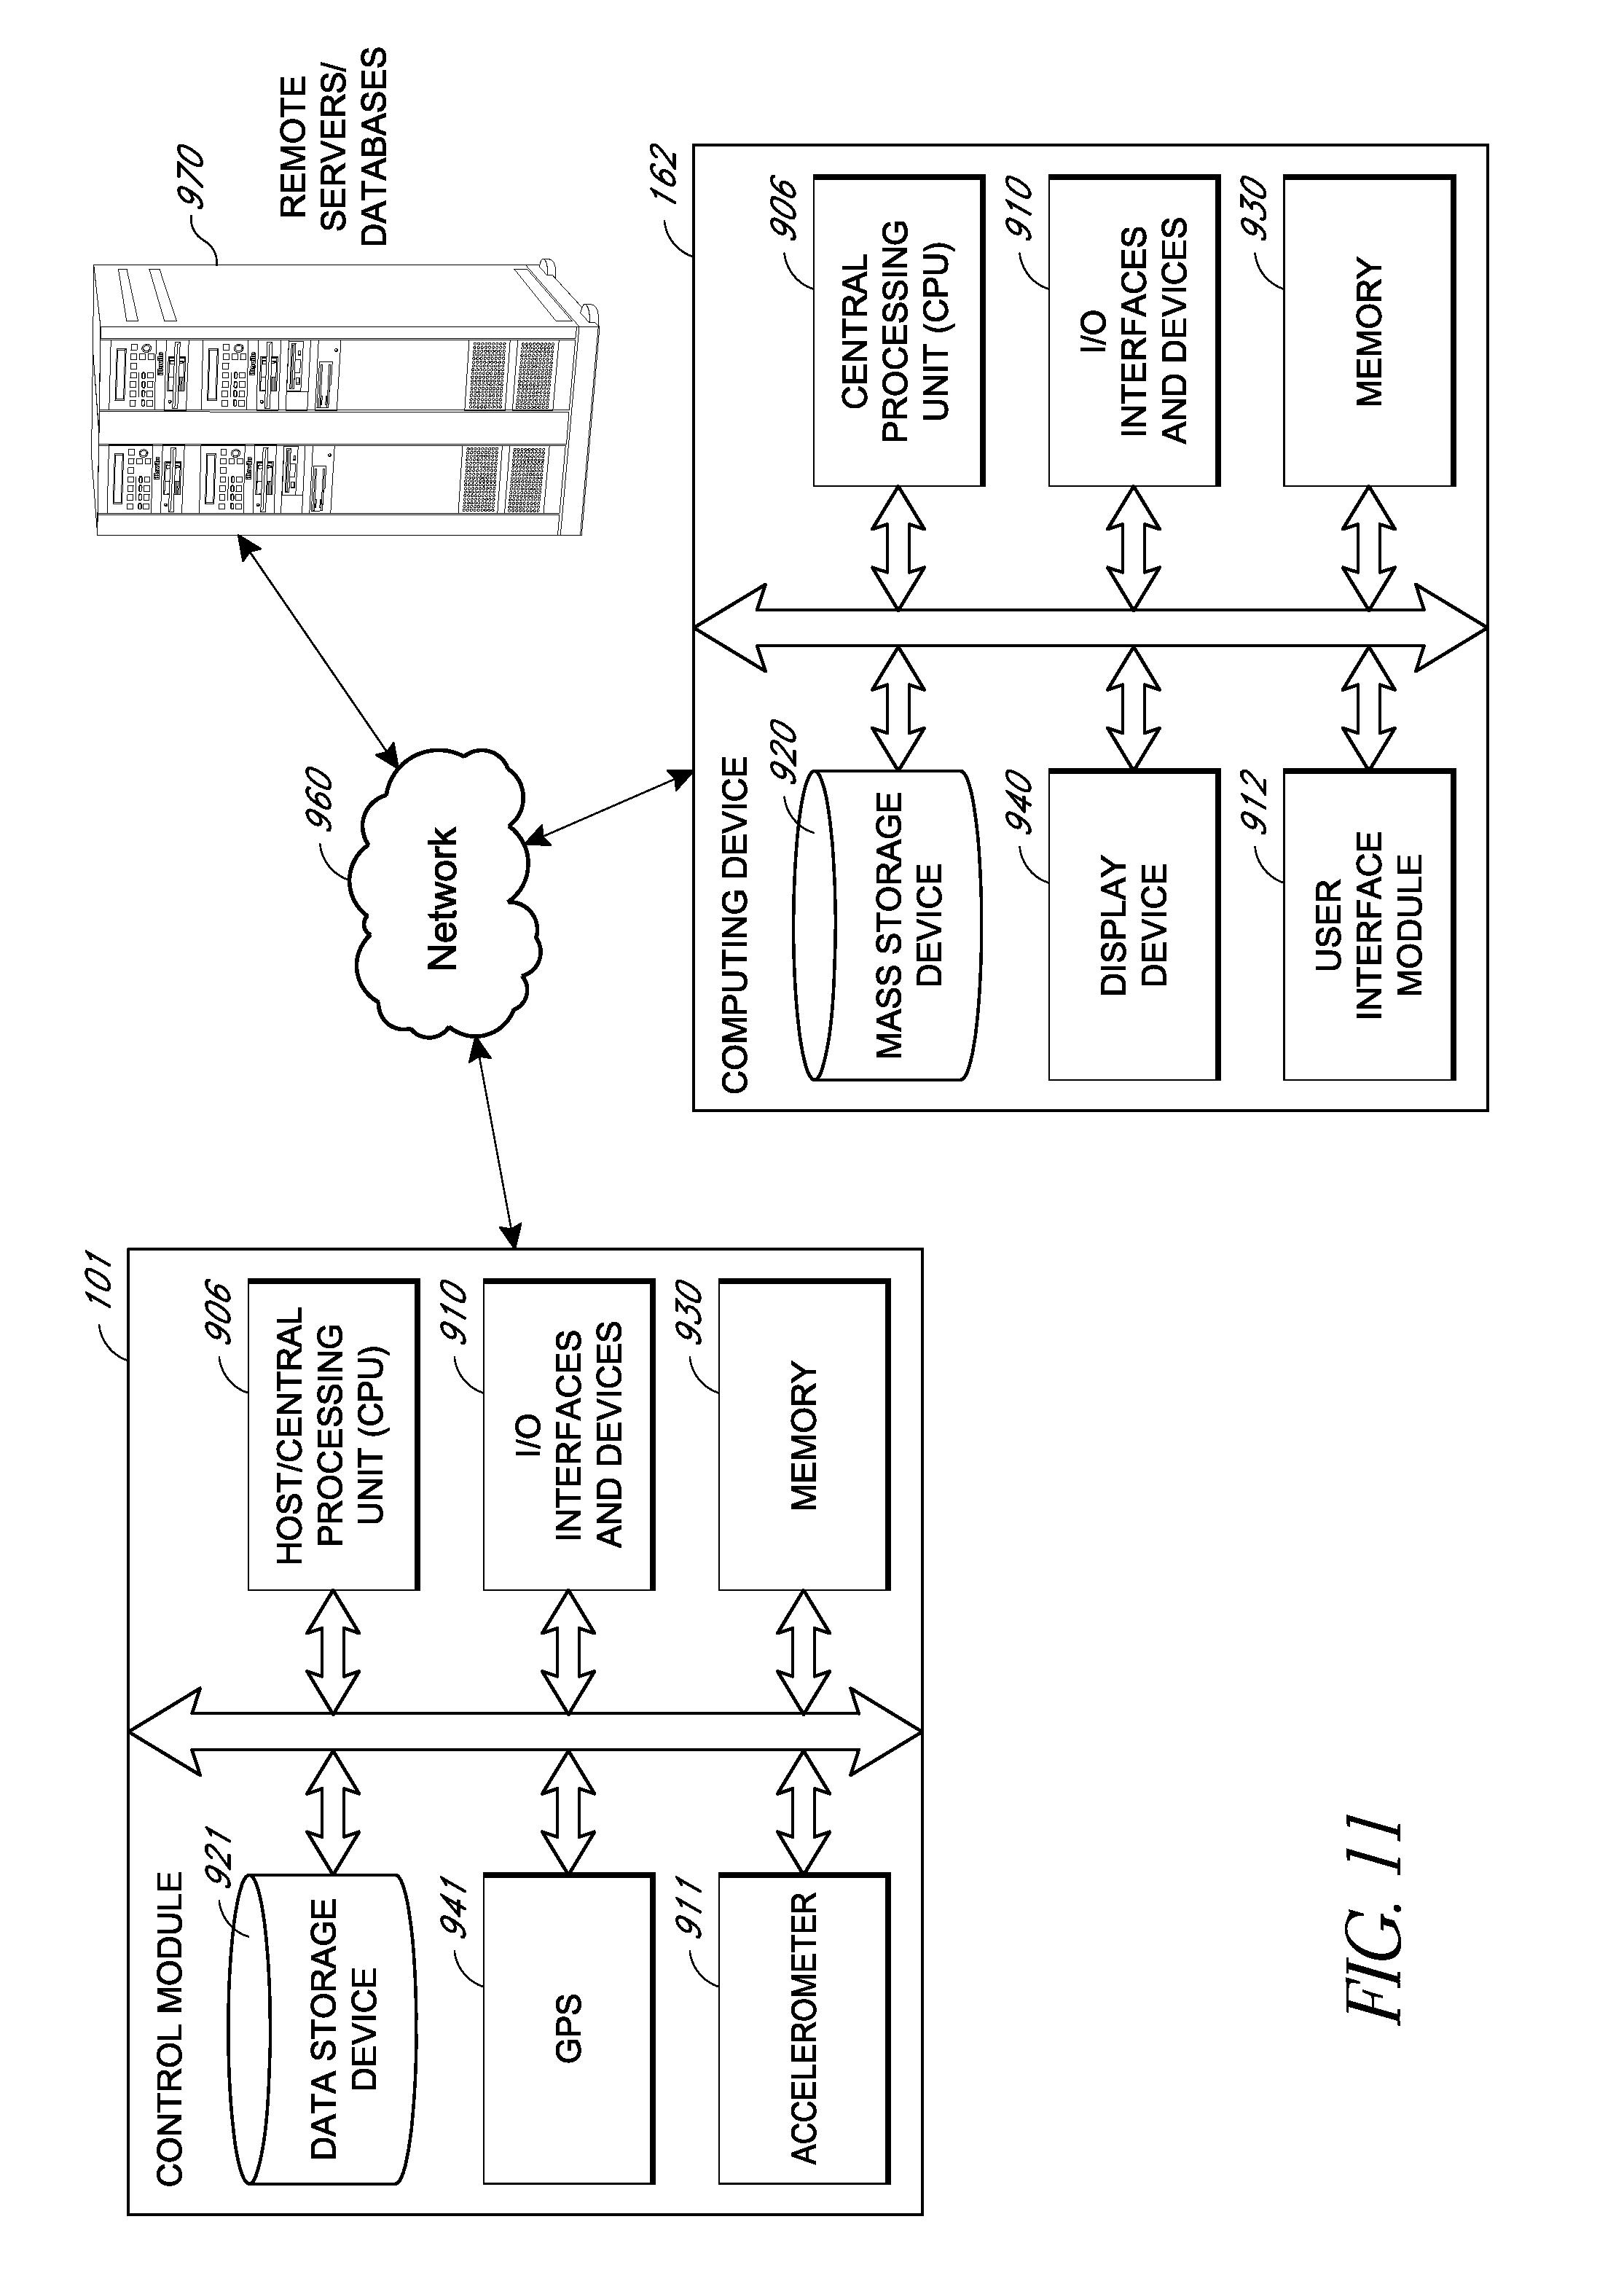 Patent Us 9373201 B2 Visiblelight Audio Transmitter Circuit Diagram Tradeoficcom 0 Petitions